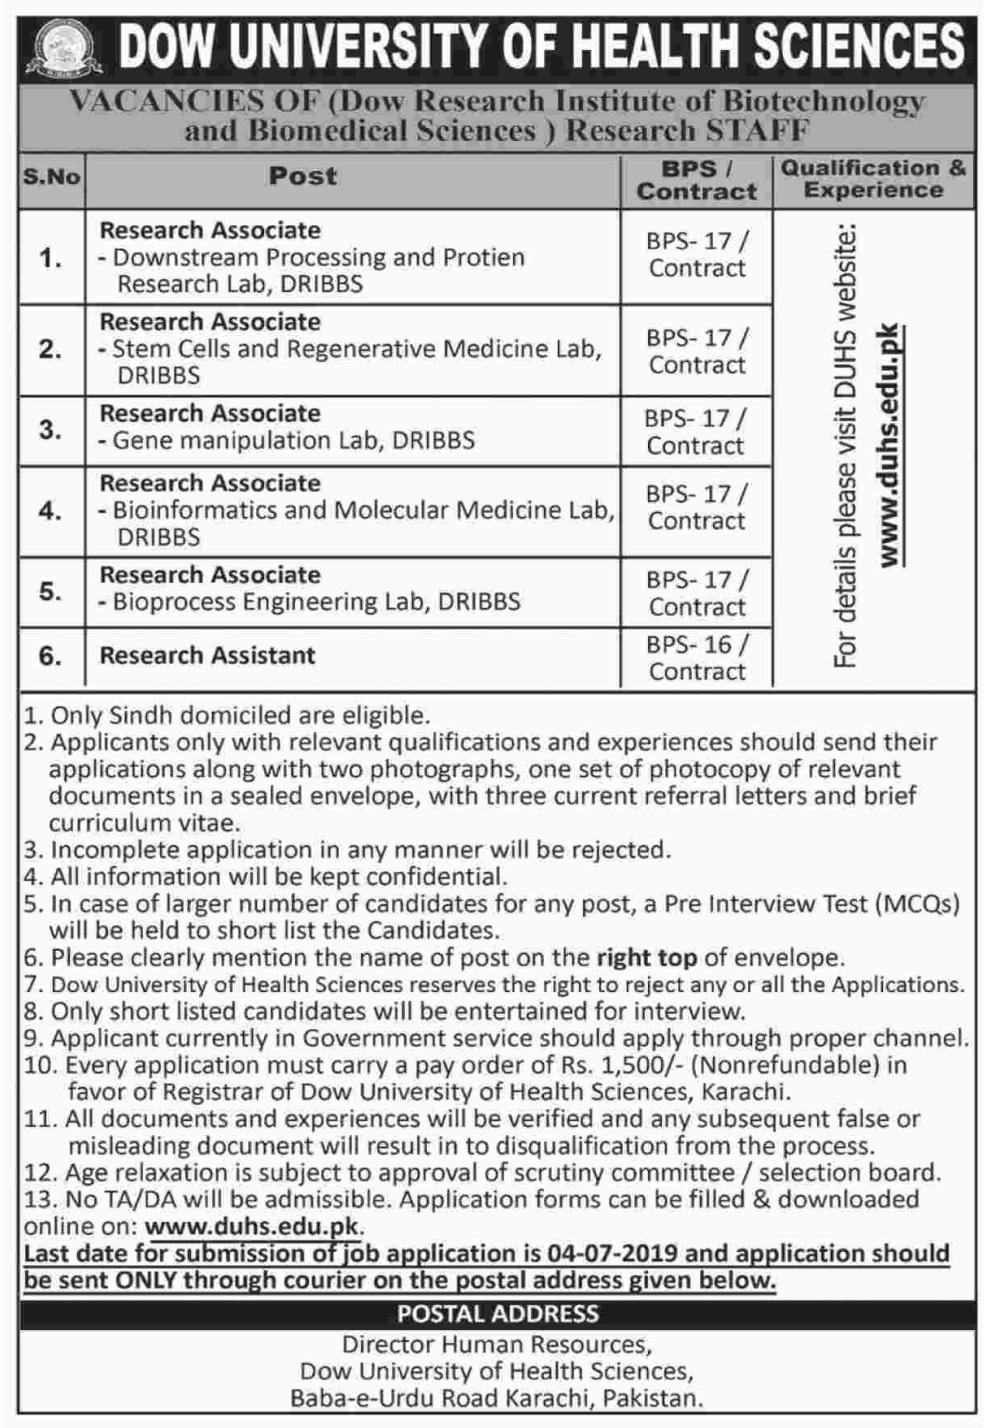 Dow University Health Sciences DUHS Karachi Jobs for Research Associate June 2019